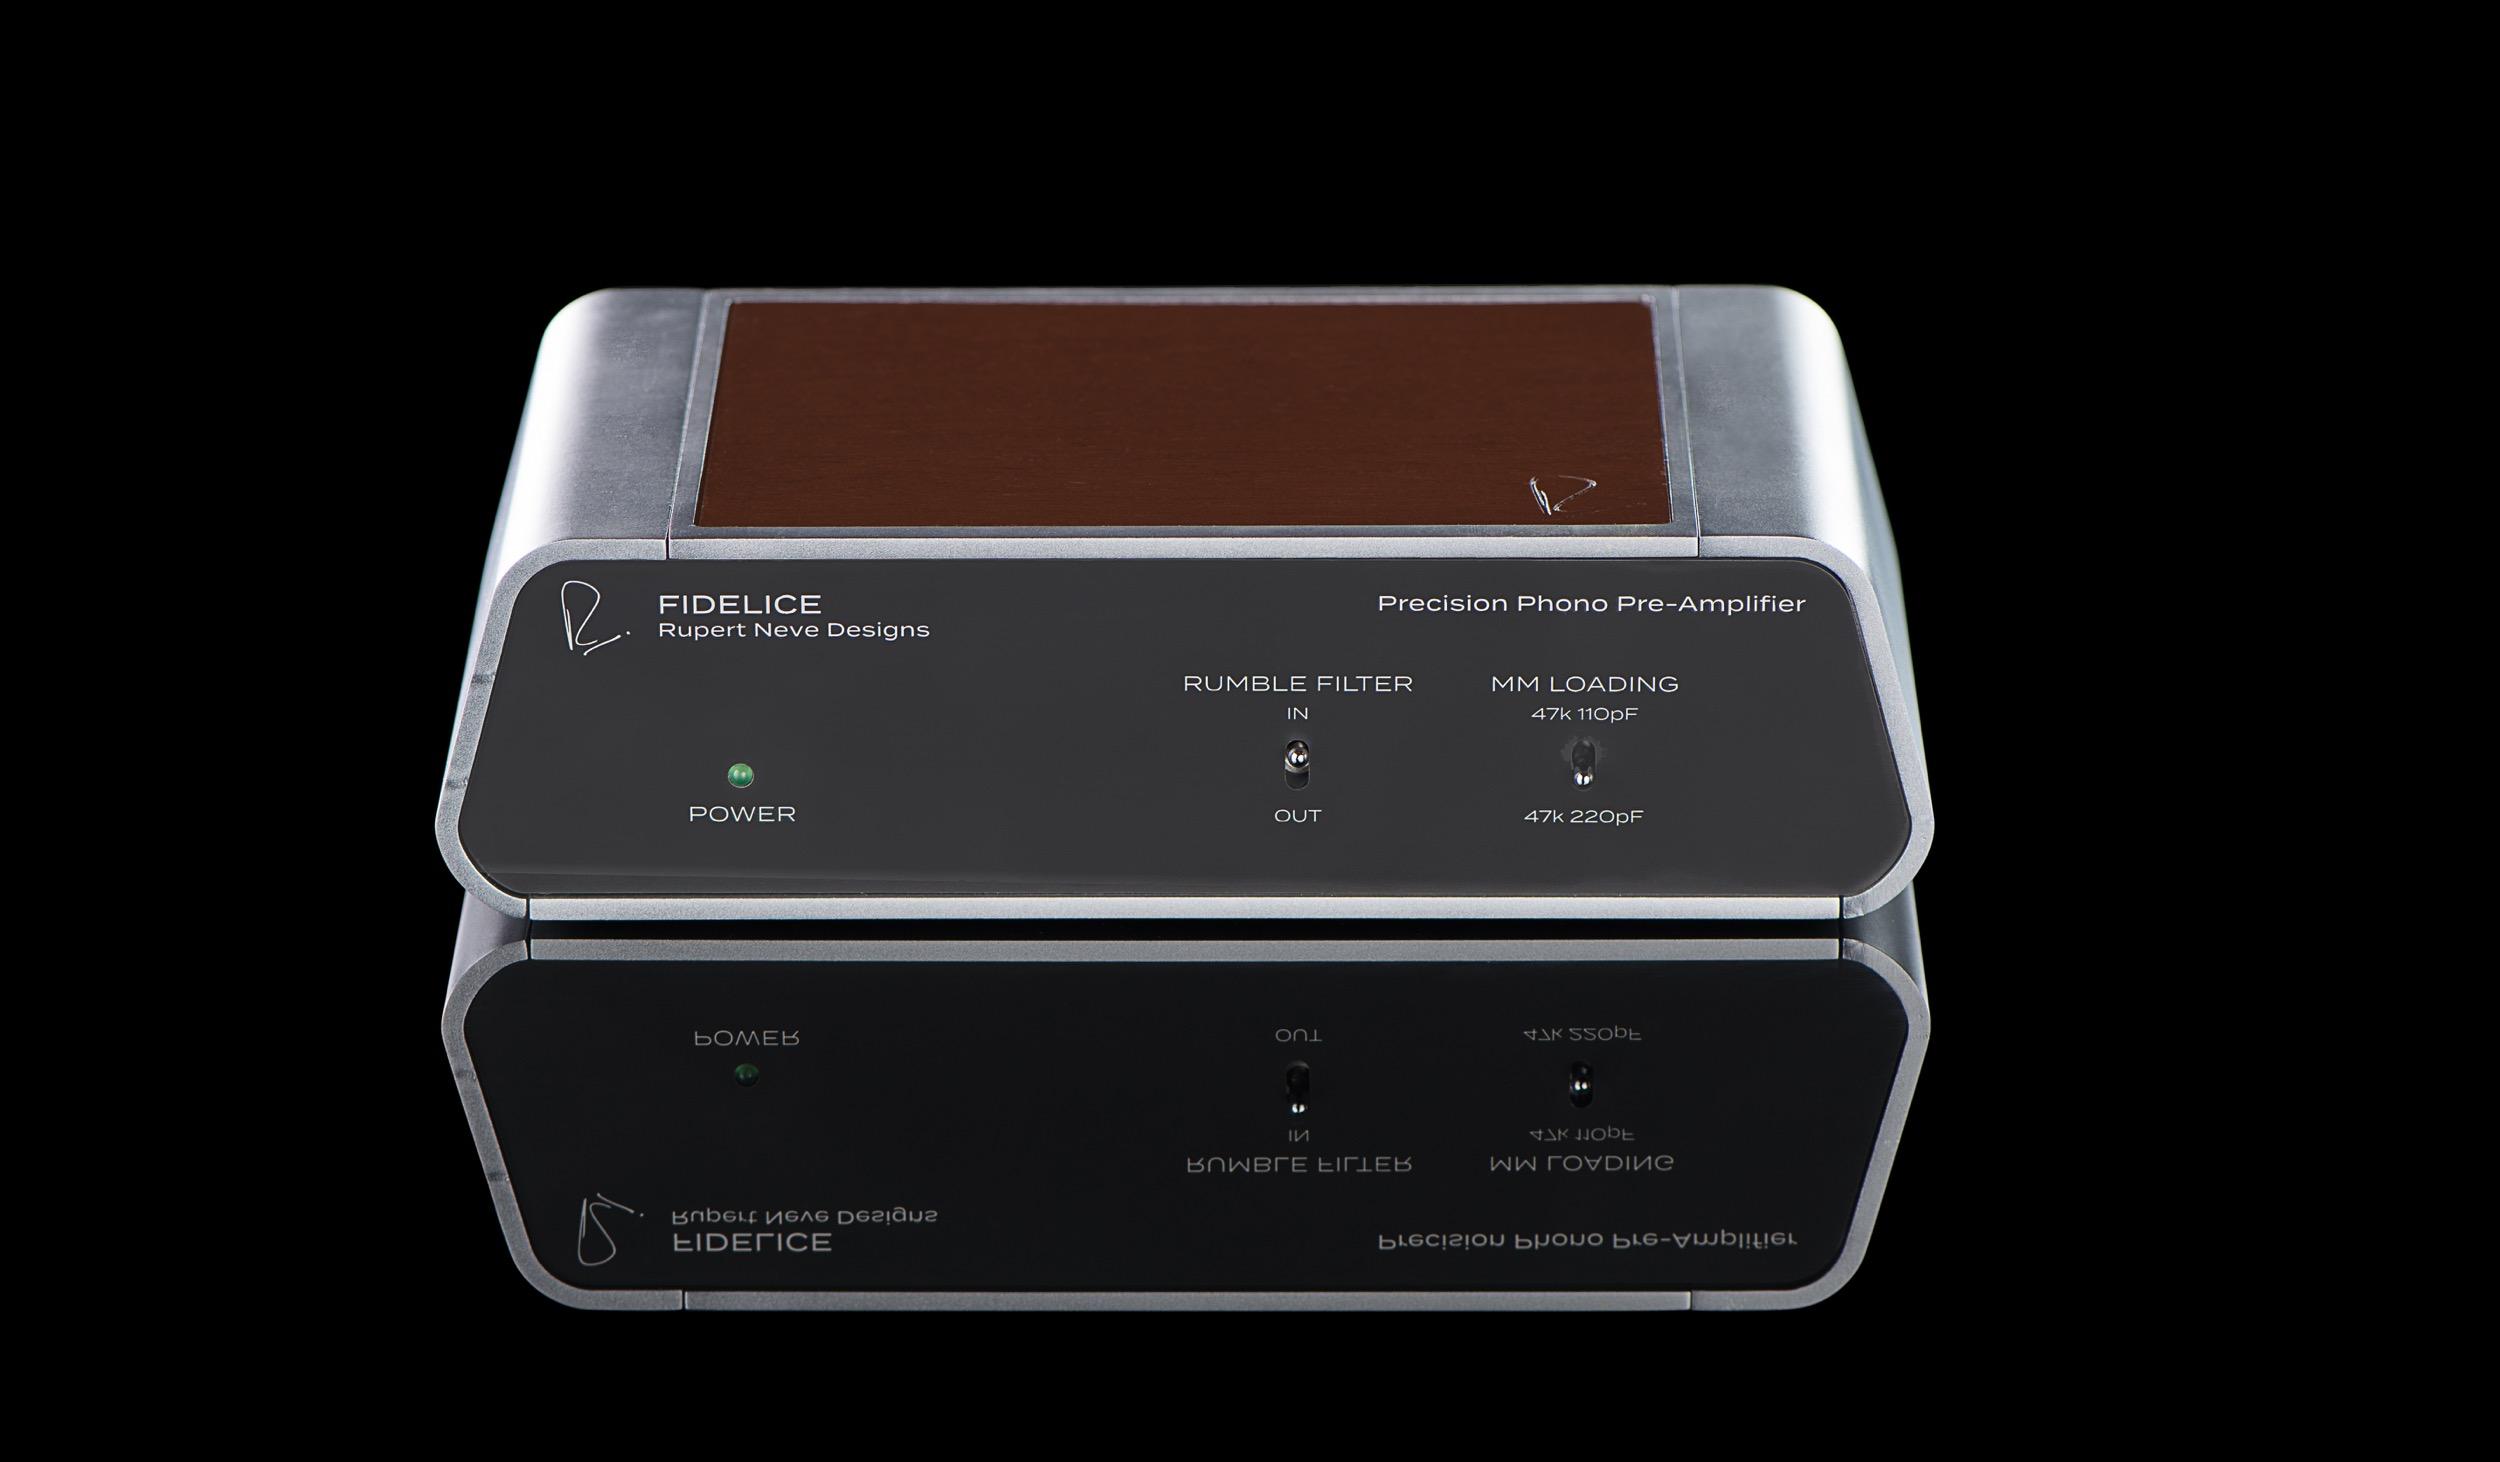 Fidelice by Rupert Neve Designs - Precision Phono Pre-Amplif